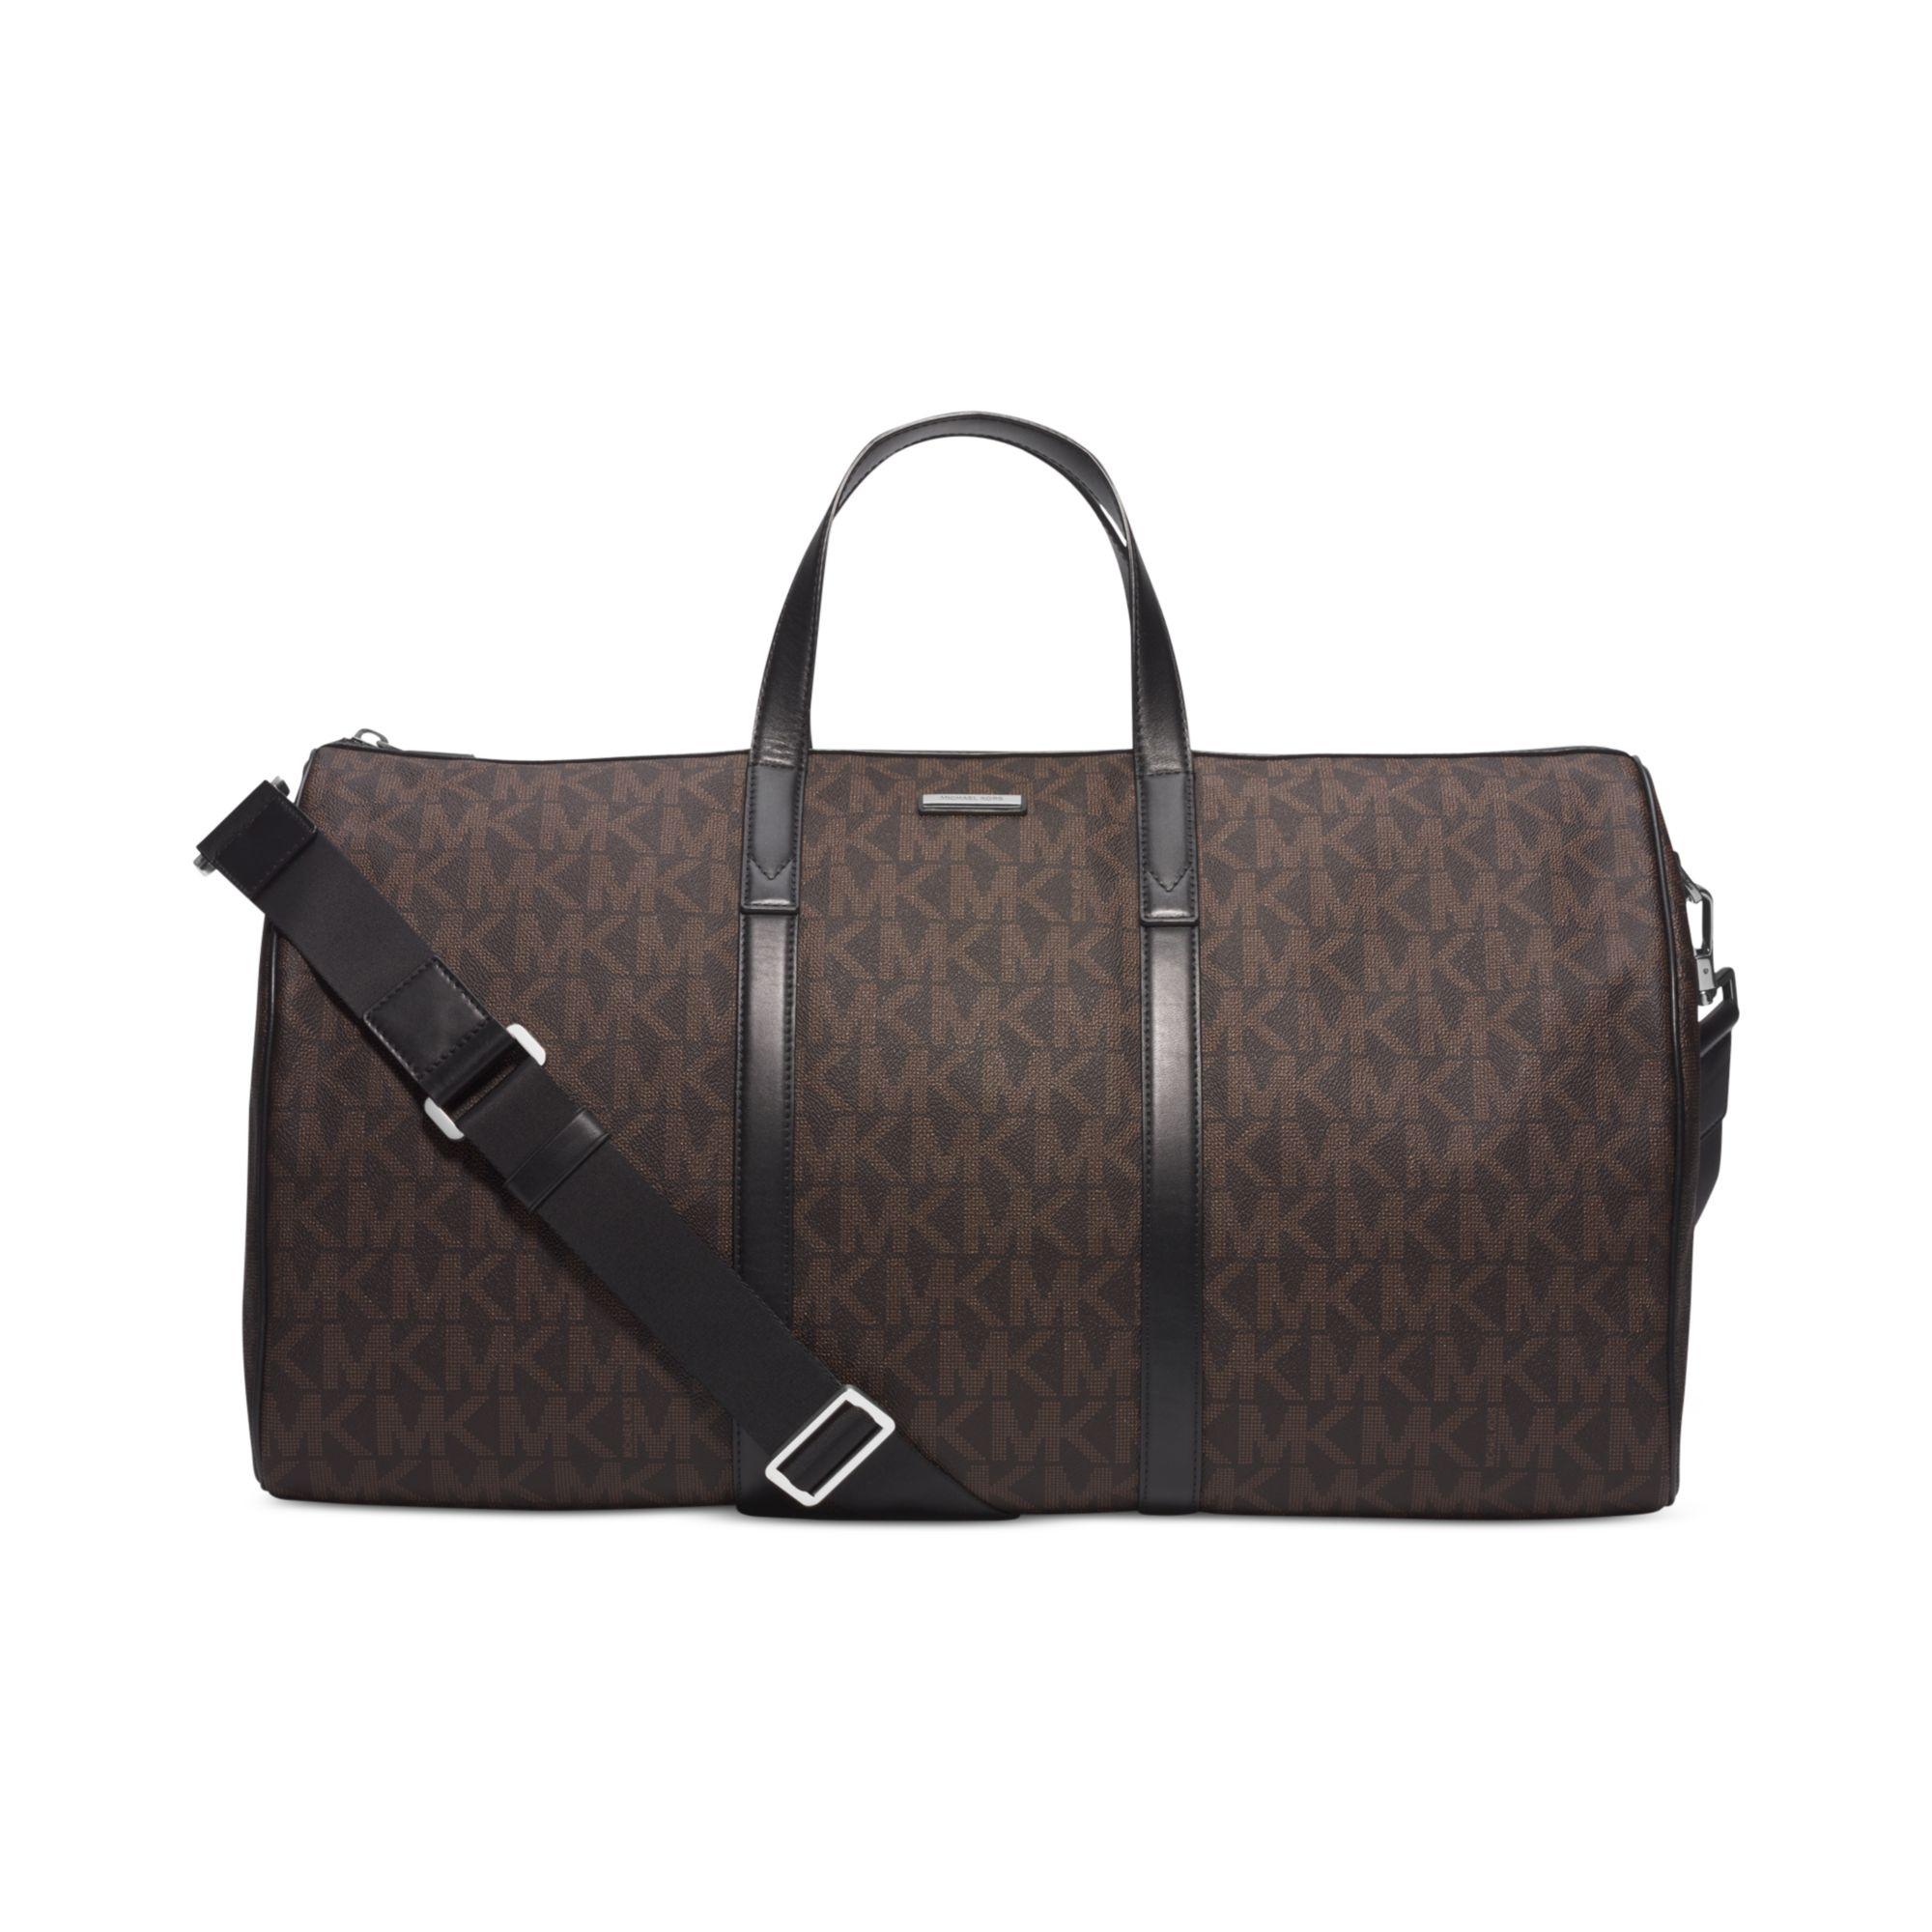 785bed2270fe Michael Kors Signature Logo Jet Set Travel Duffle Bag in Brown for ...